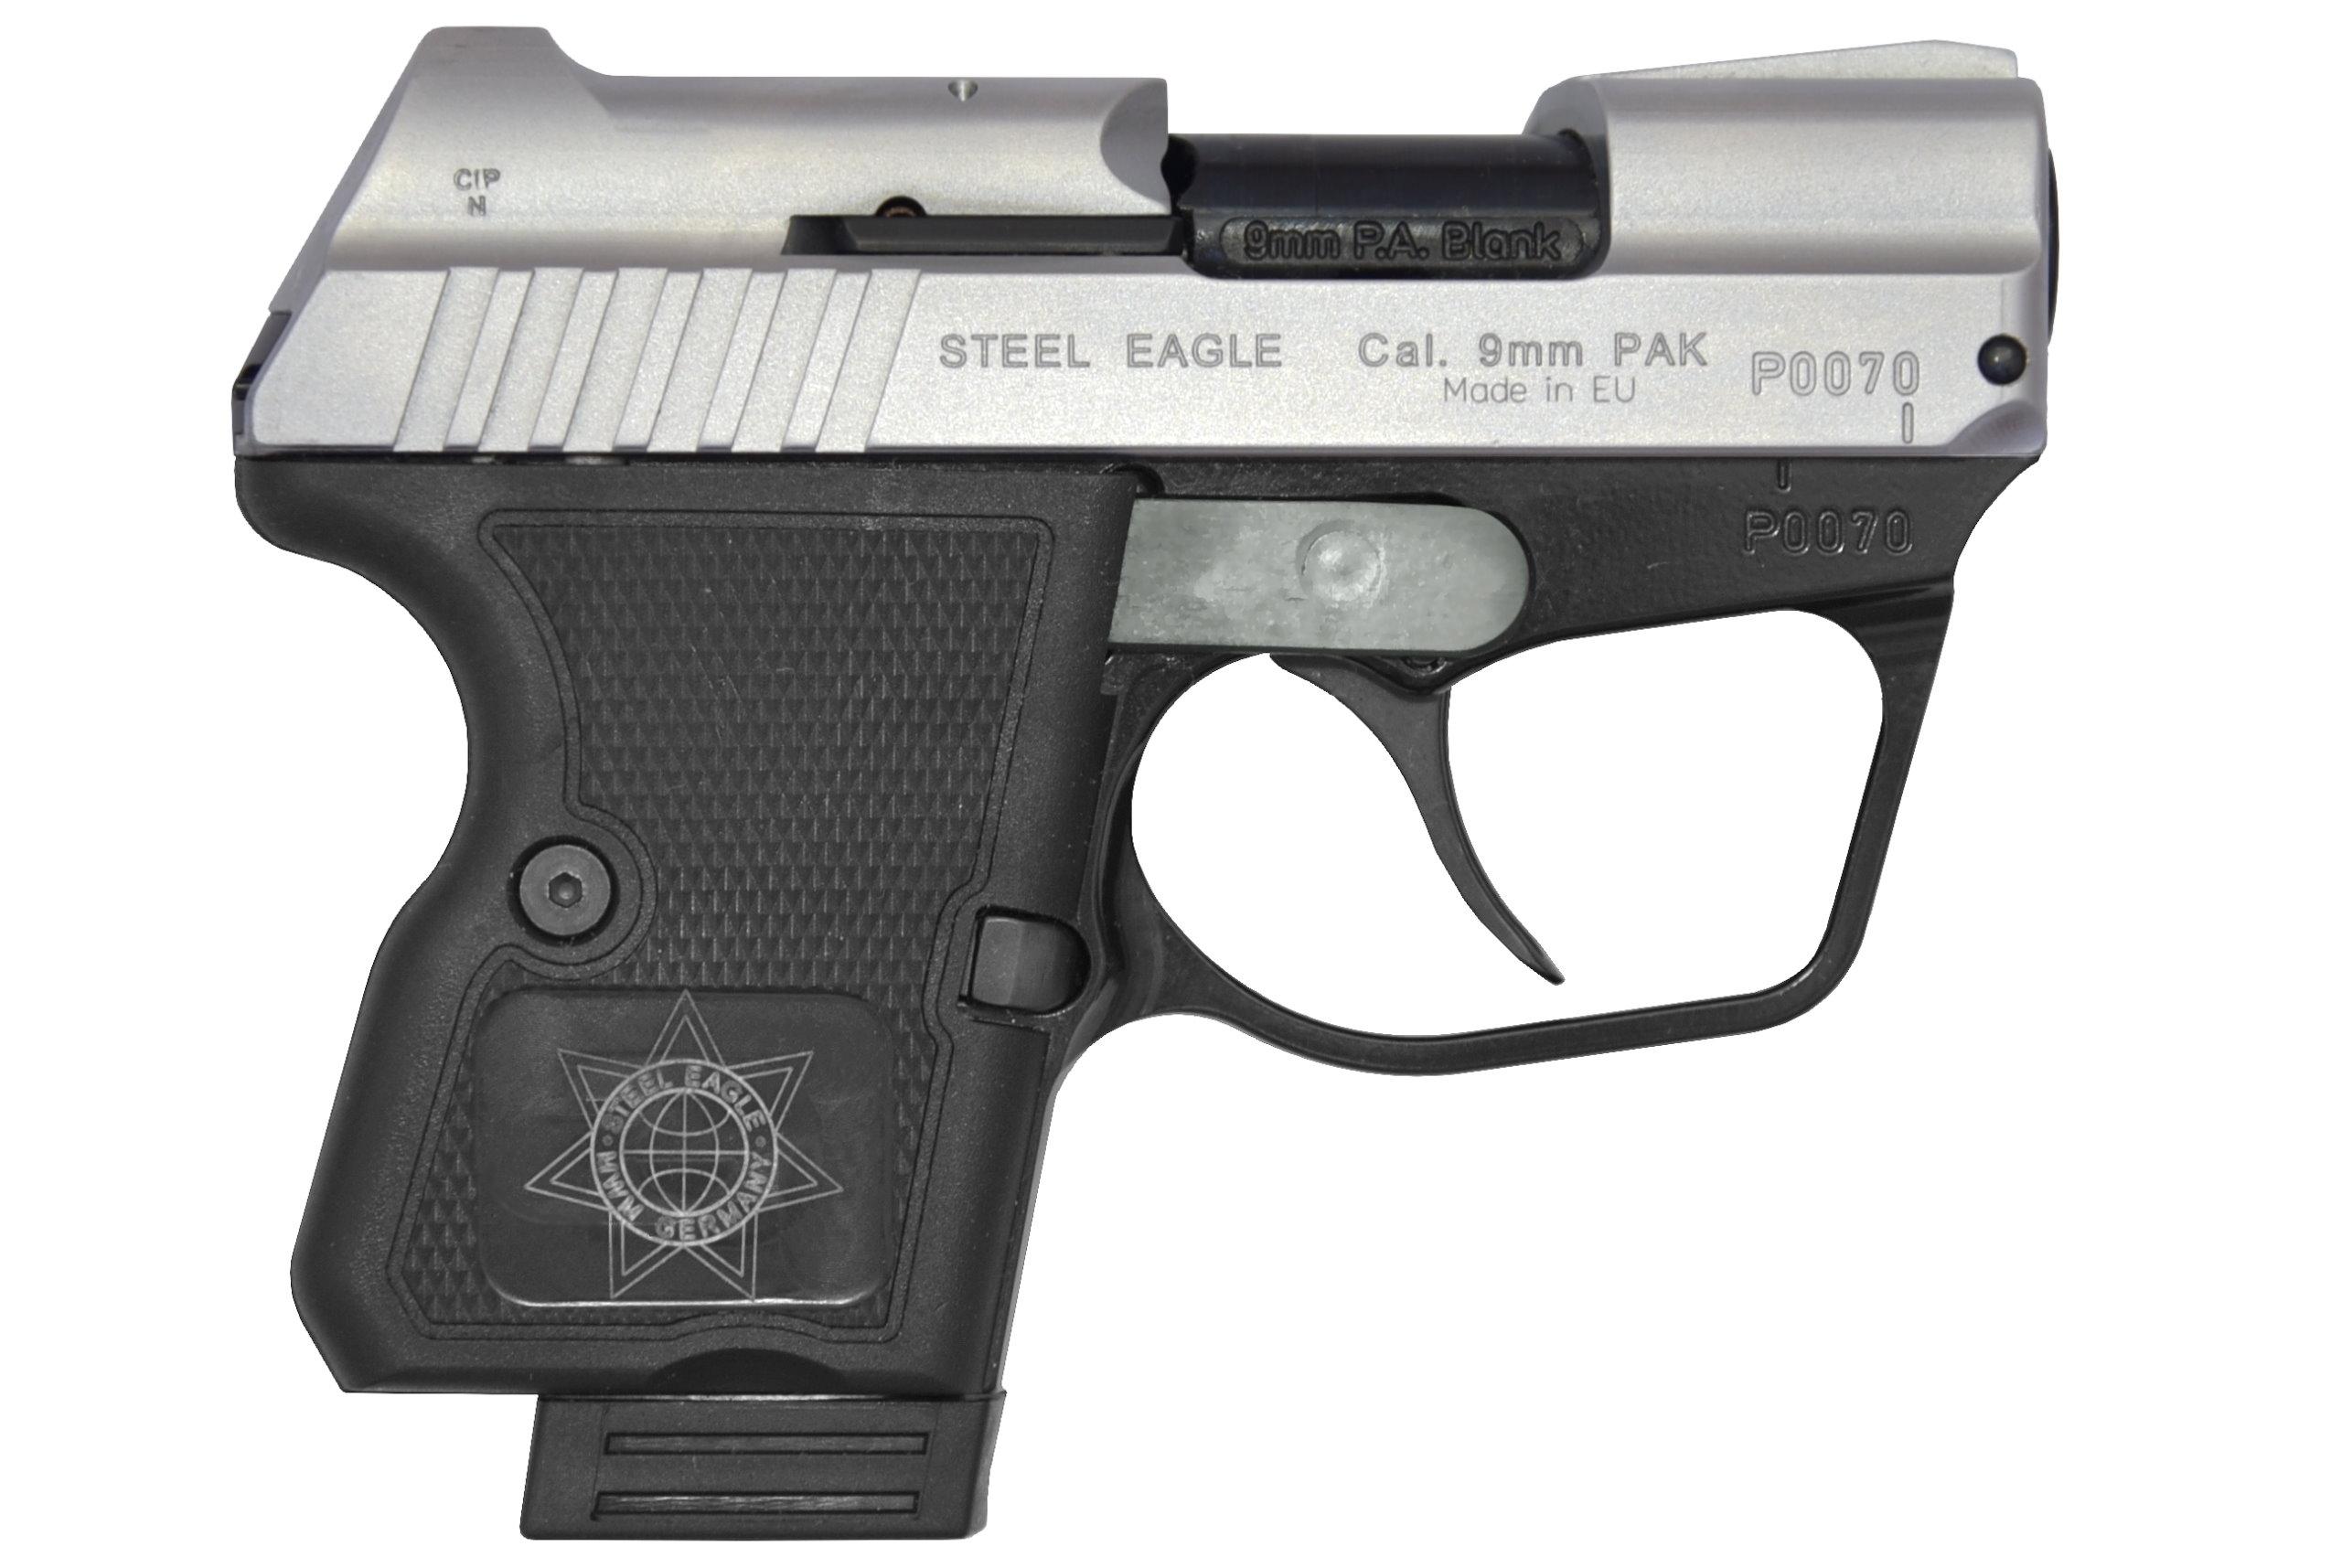 STEEL EAGLE (C) CNC 9mm PAK Vanadium-Chrome Finish Blank Firing Gun